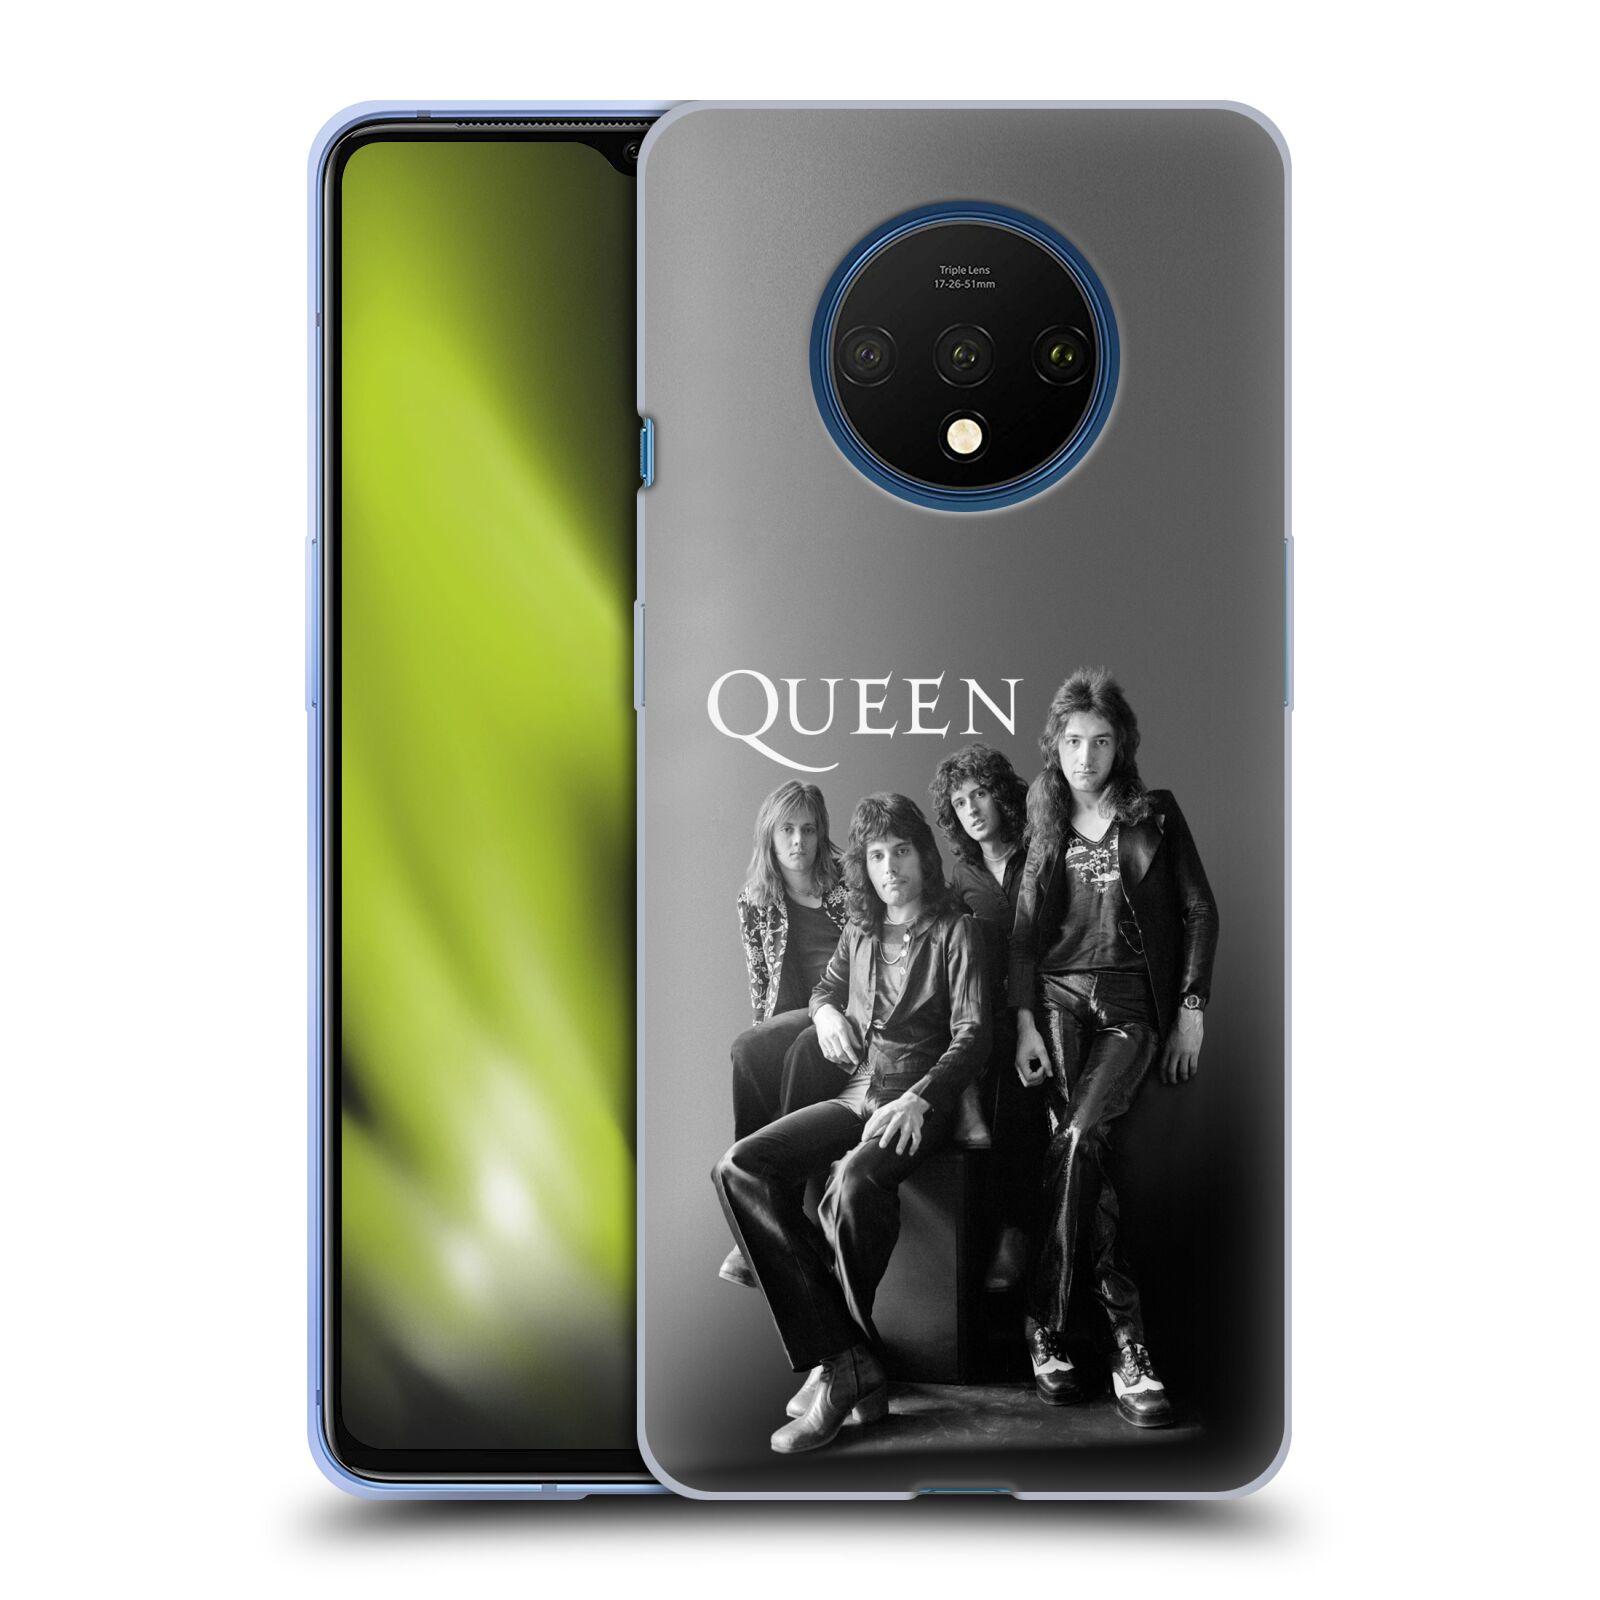 Silikonové pouzdro na mobil OnePlus 7T - Head Case - Queen - Skupina